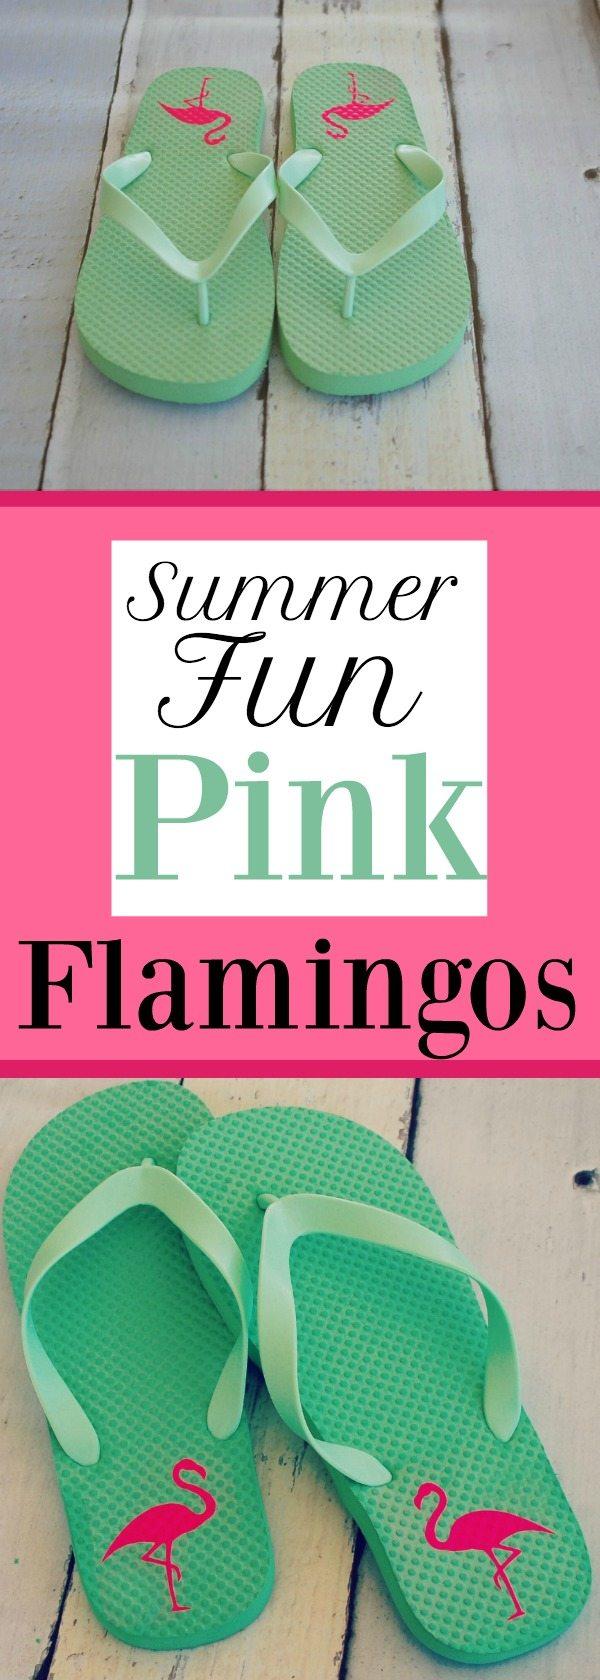 Summer fun flip flops with Pink Flamingos